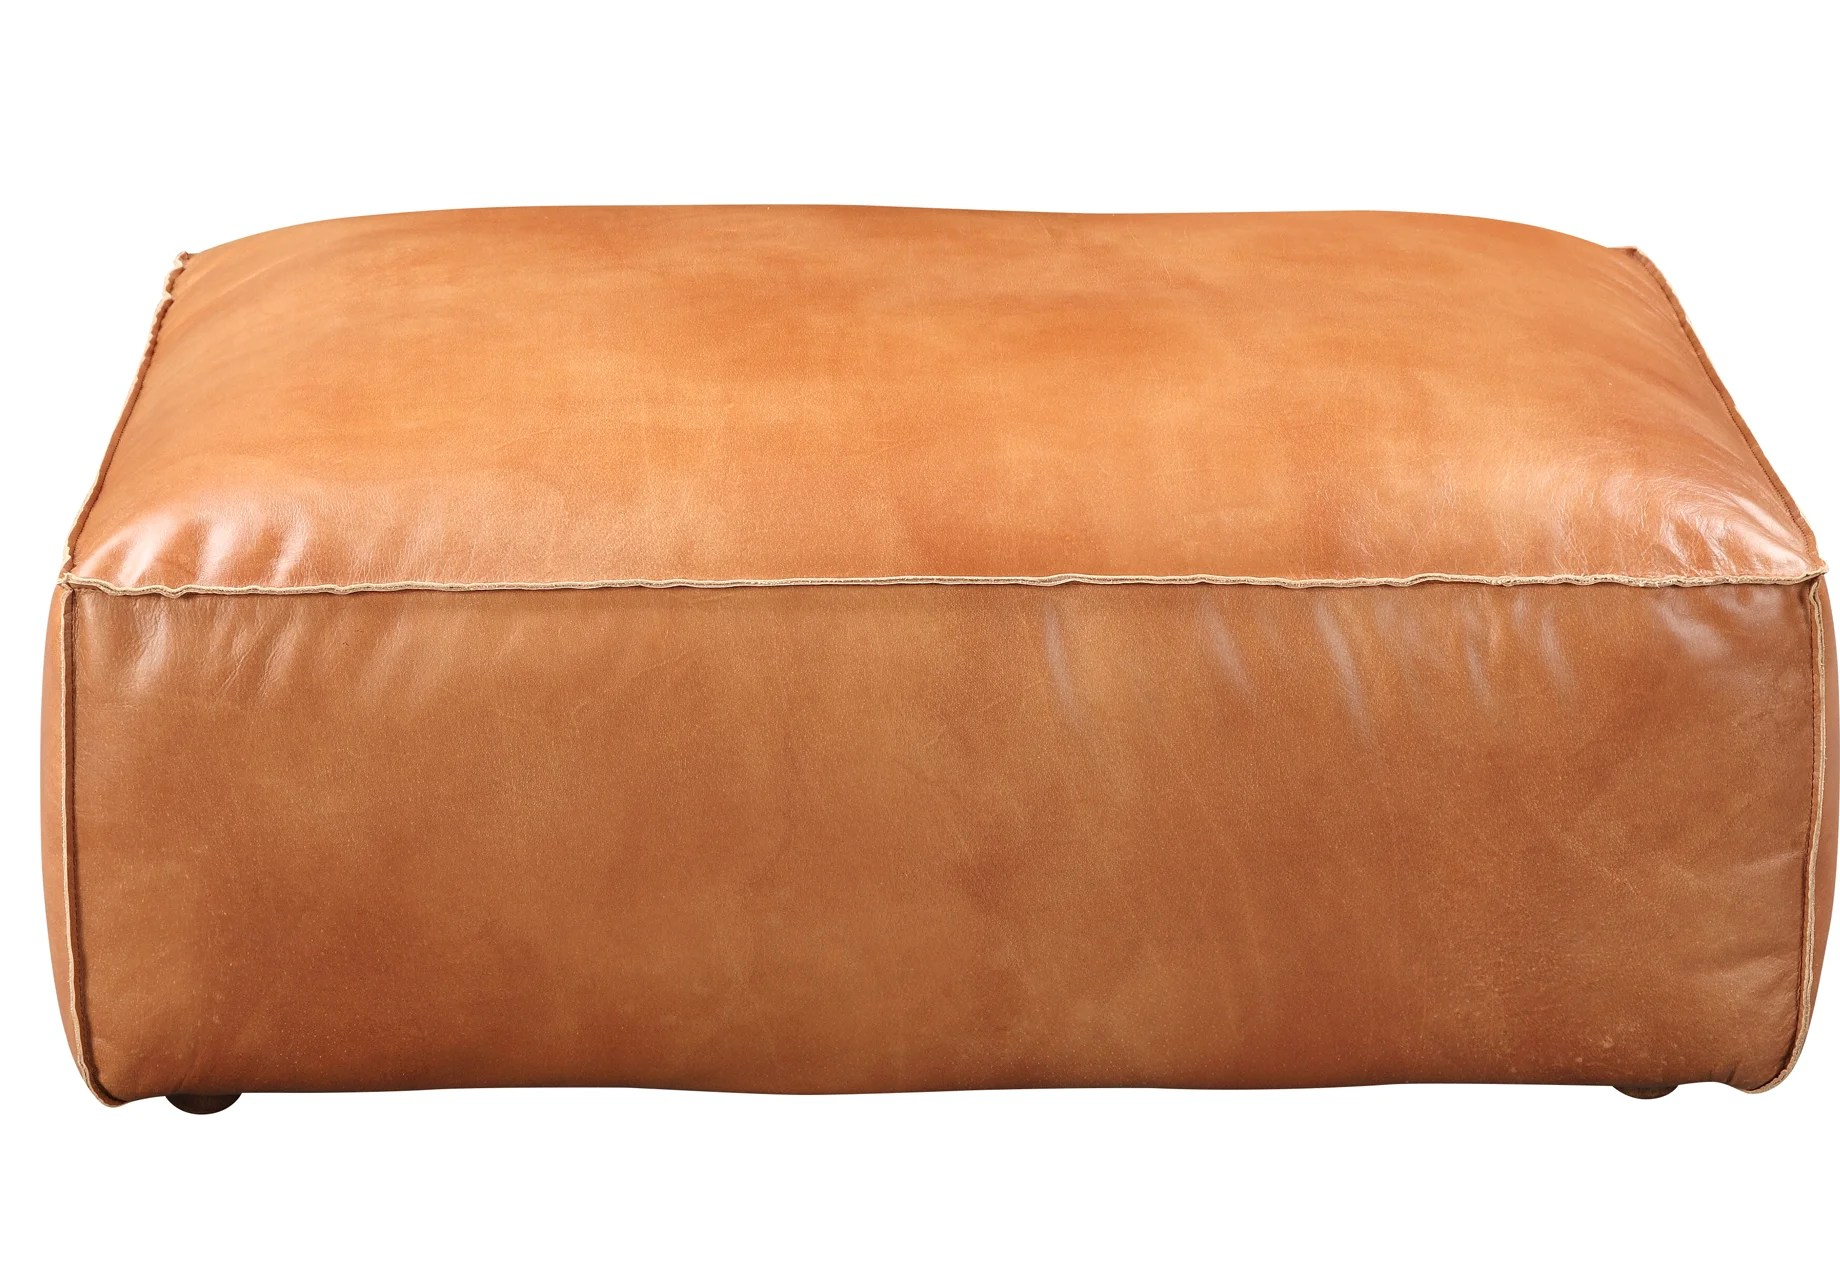 leather ottomans poufs free